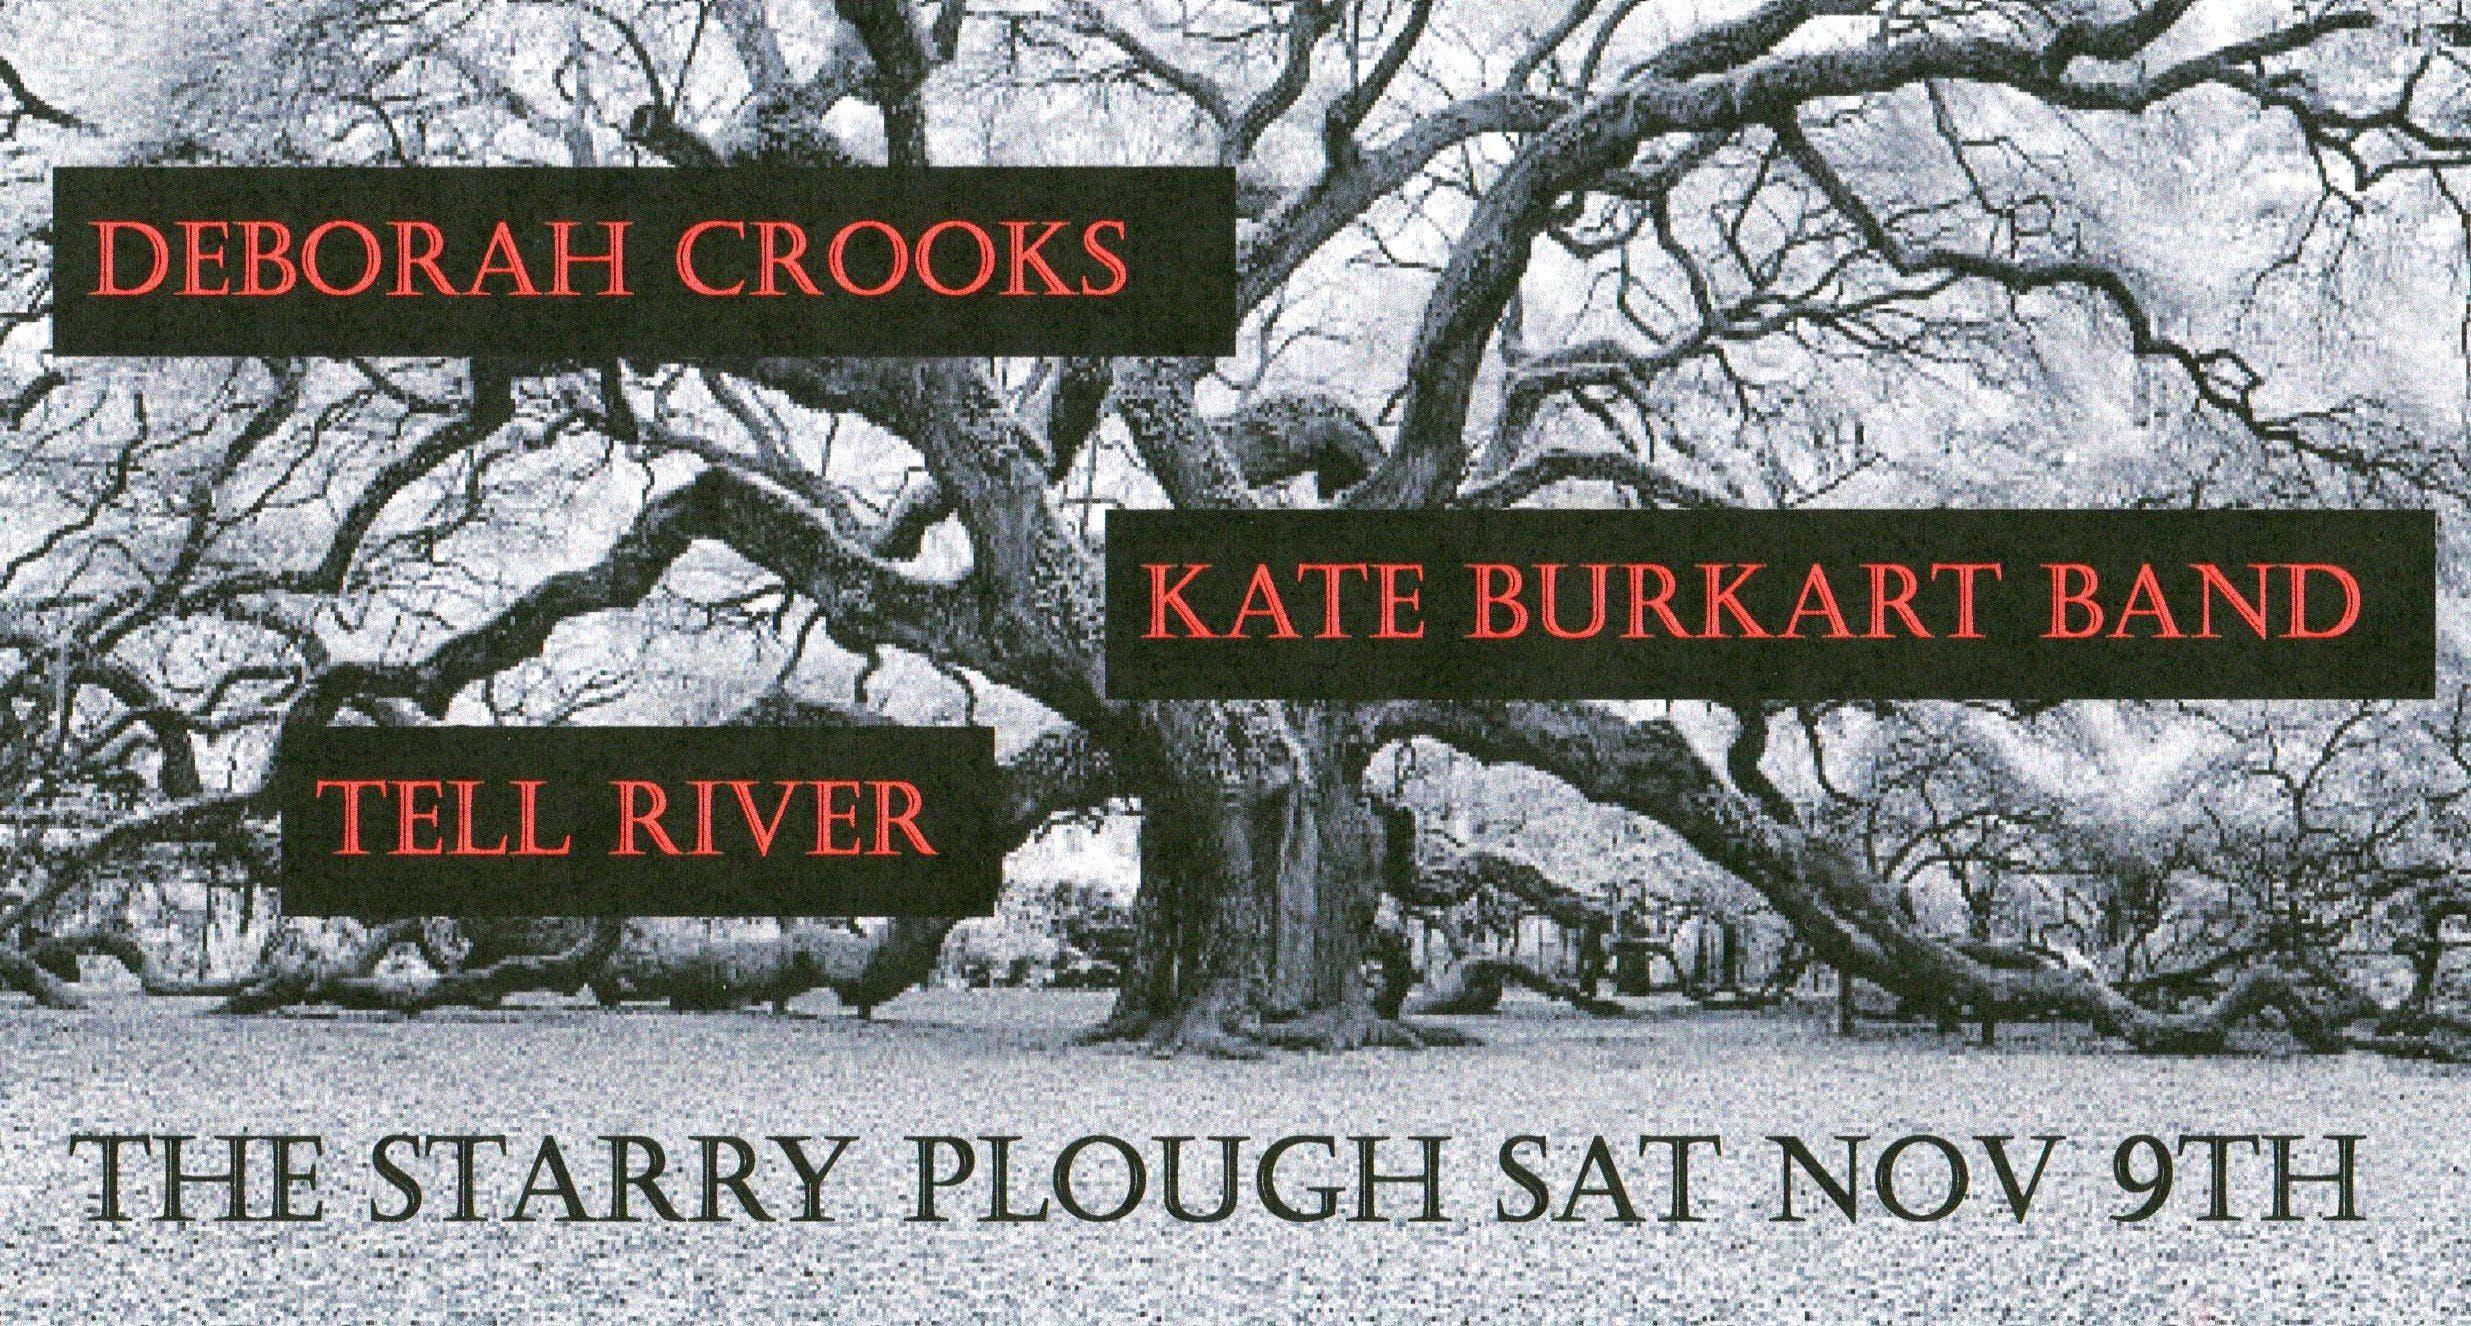 Tell River, Kate Burkart, Deborah Crooks